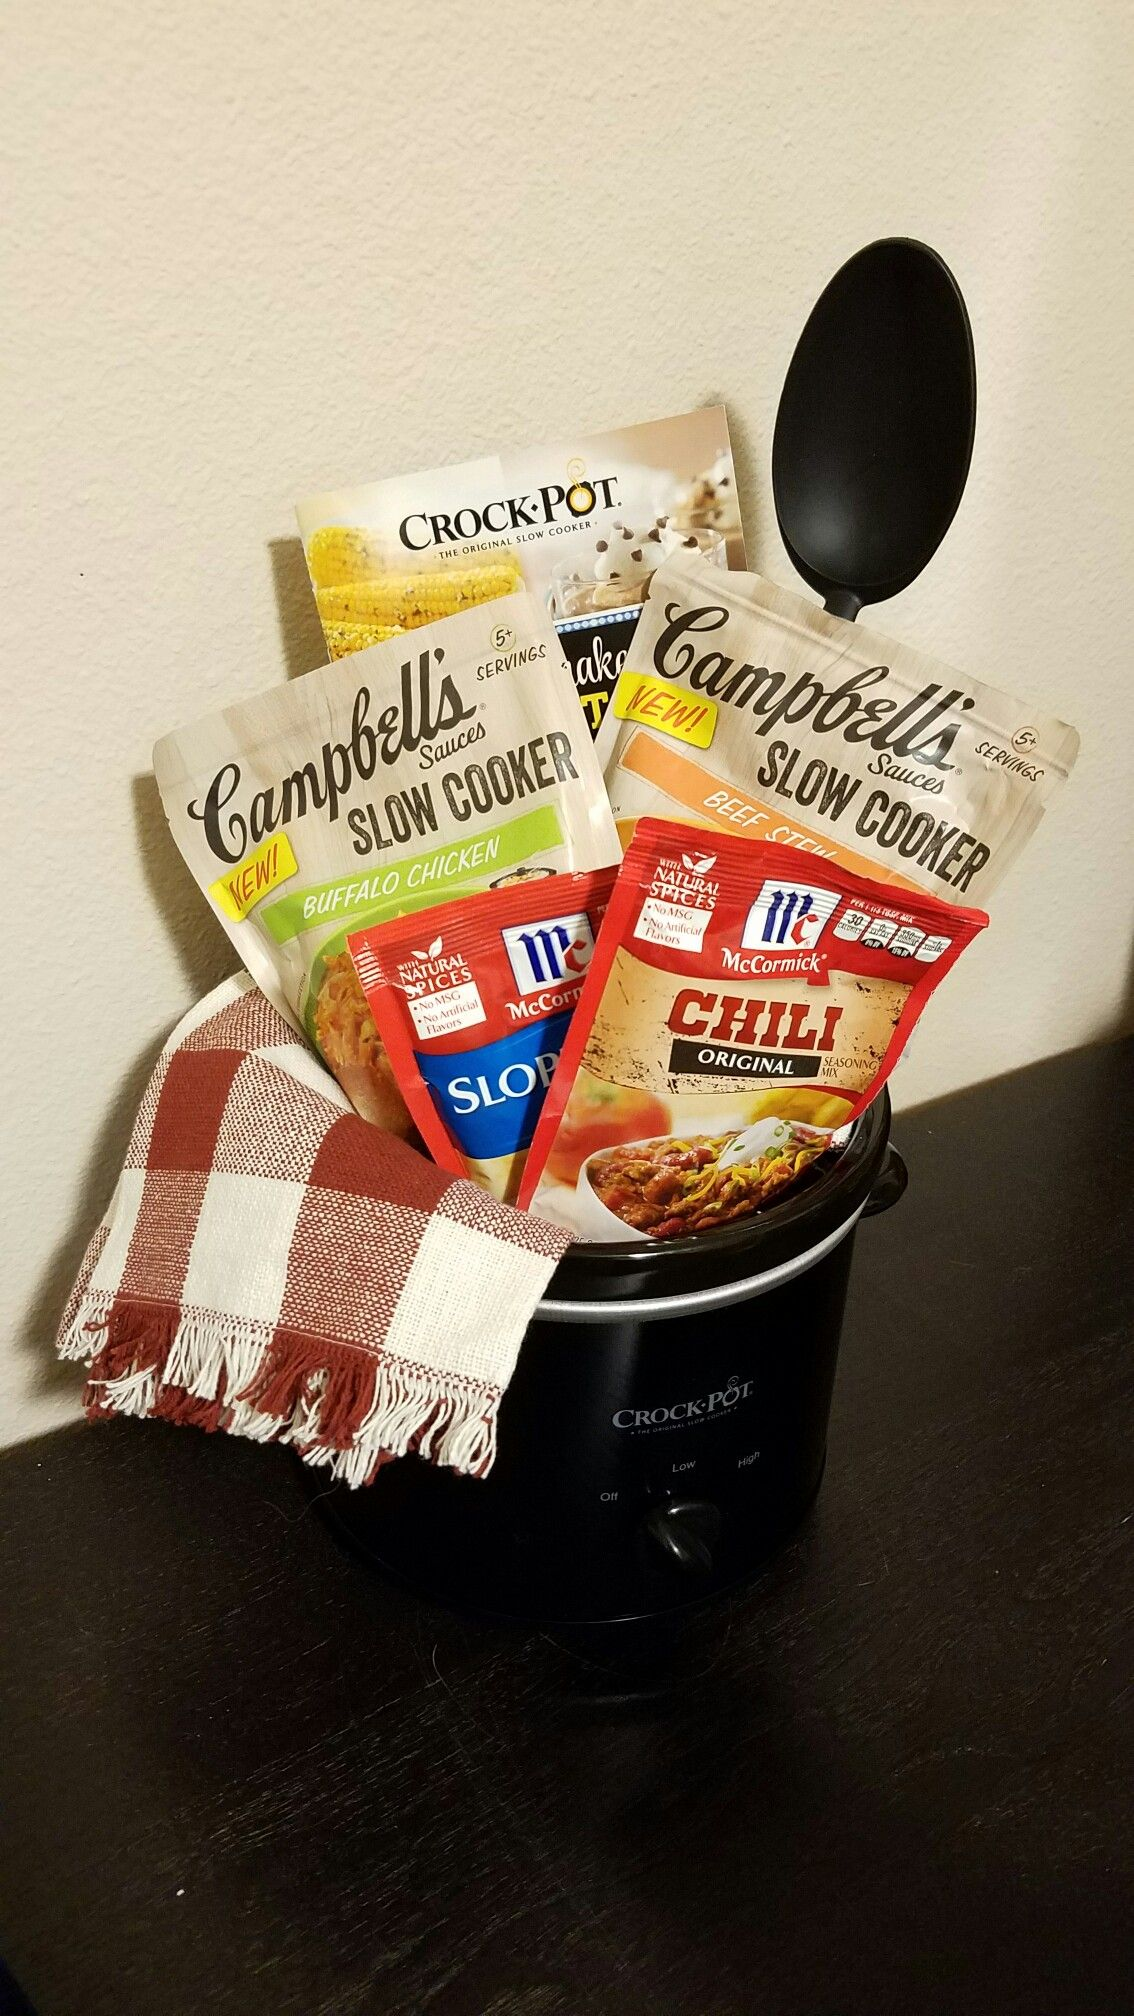 crockpot kitchen dinner gift basket silent auction fundraiser crockpot kitchen dinner gift basket silent auction fundraiser for work 2016